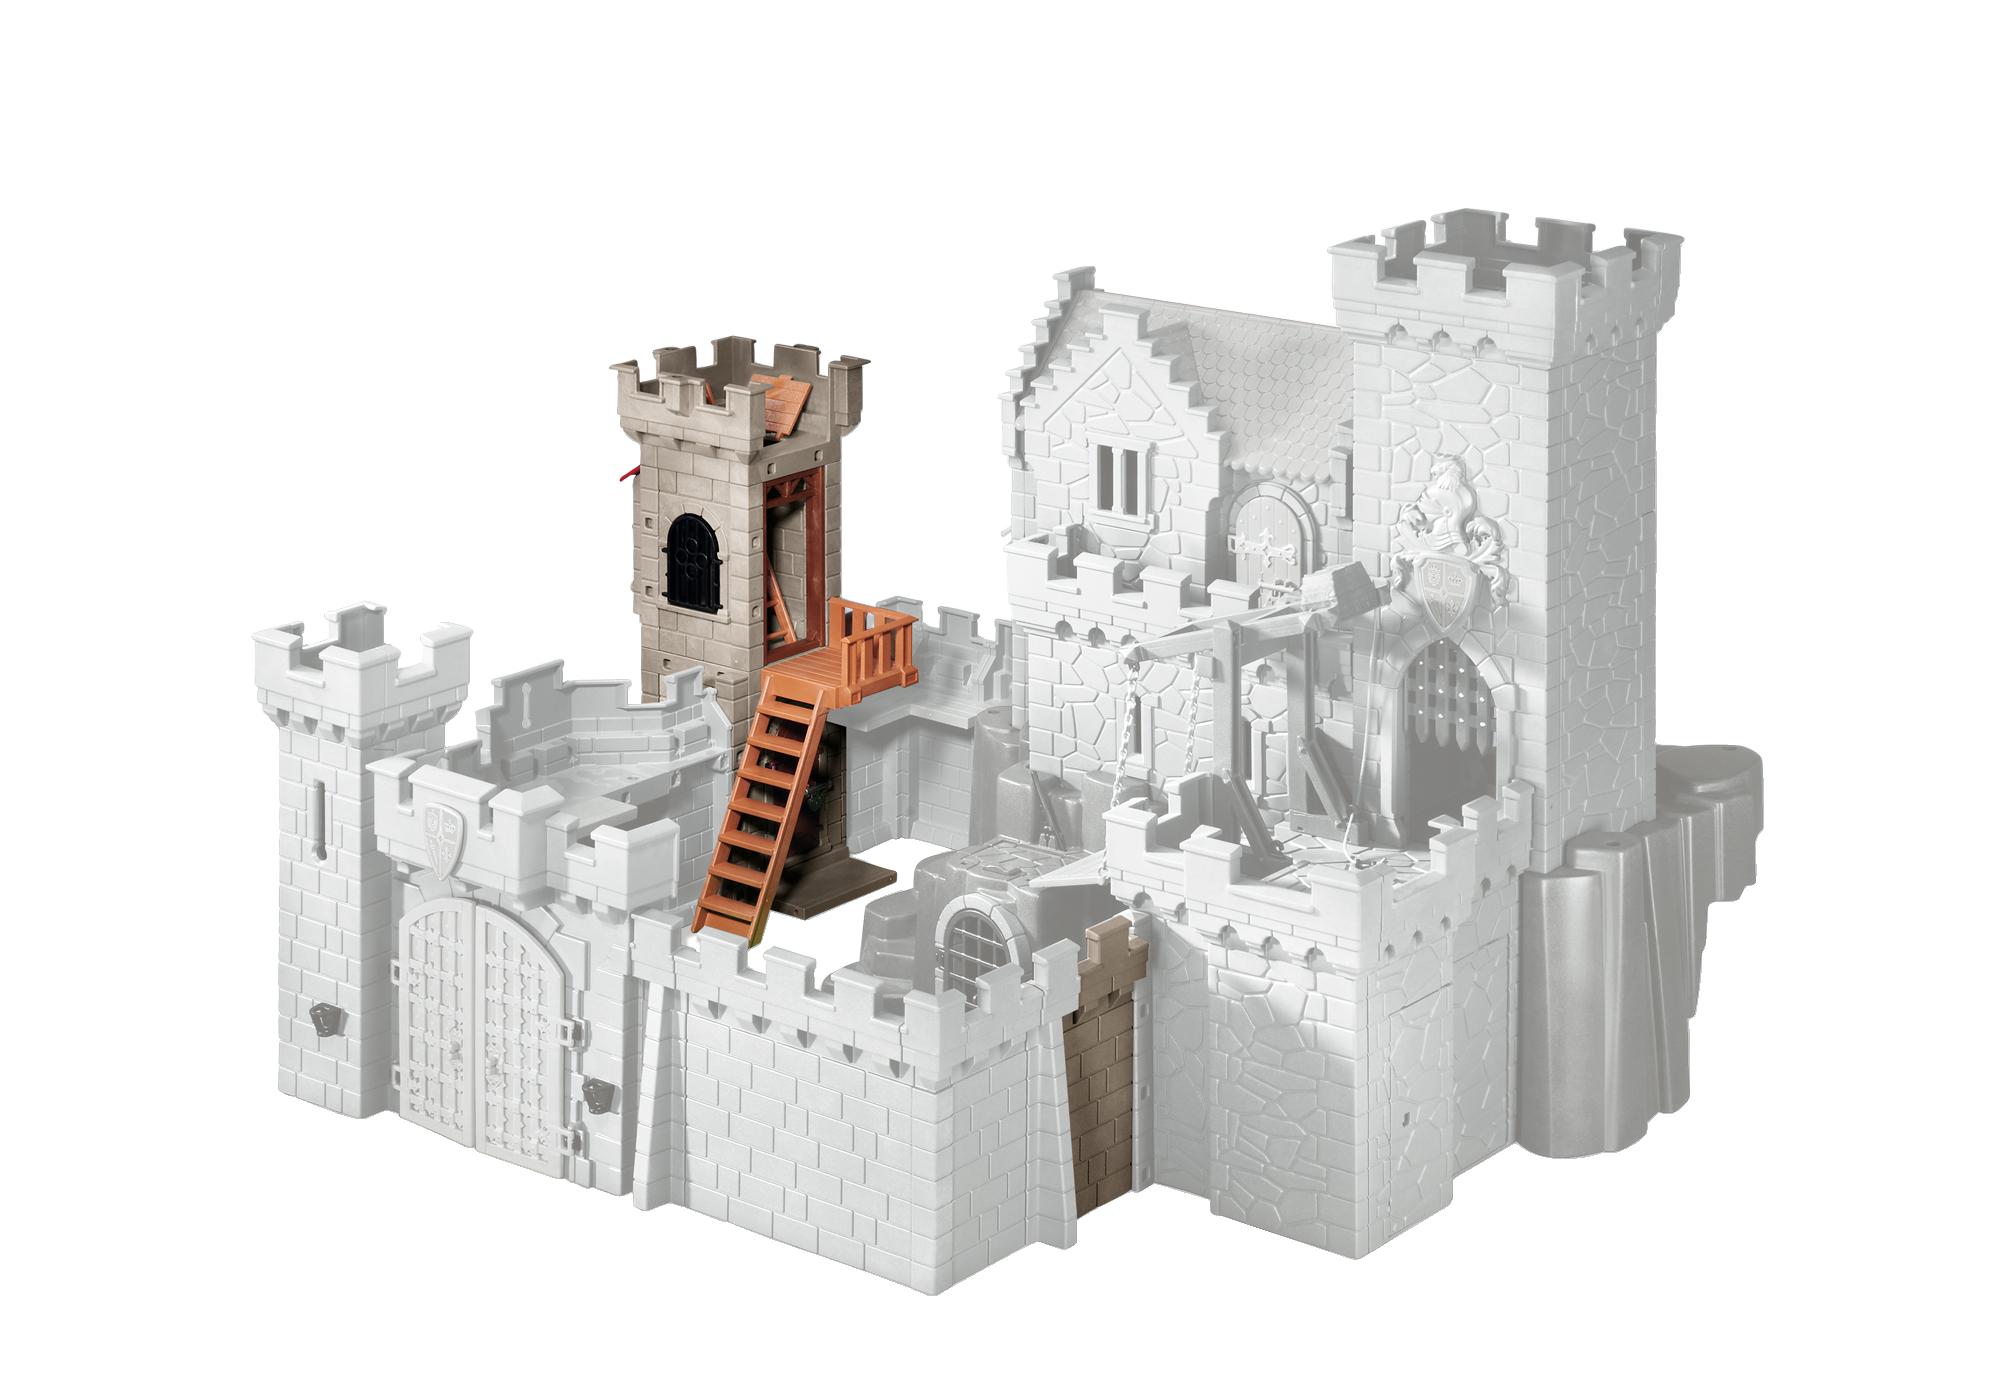 http://media.playmobil.com/i/playmobil/6373_product_detail/Extensión Torre para Castillo de los Caballeros Reales del León